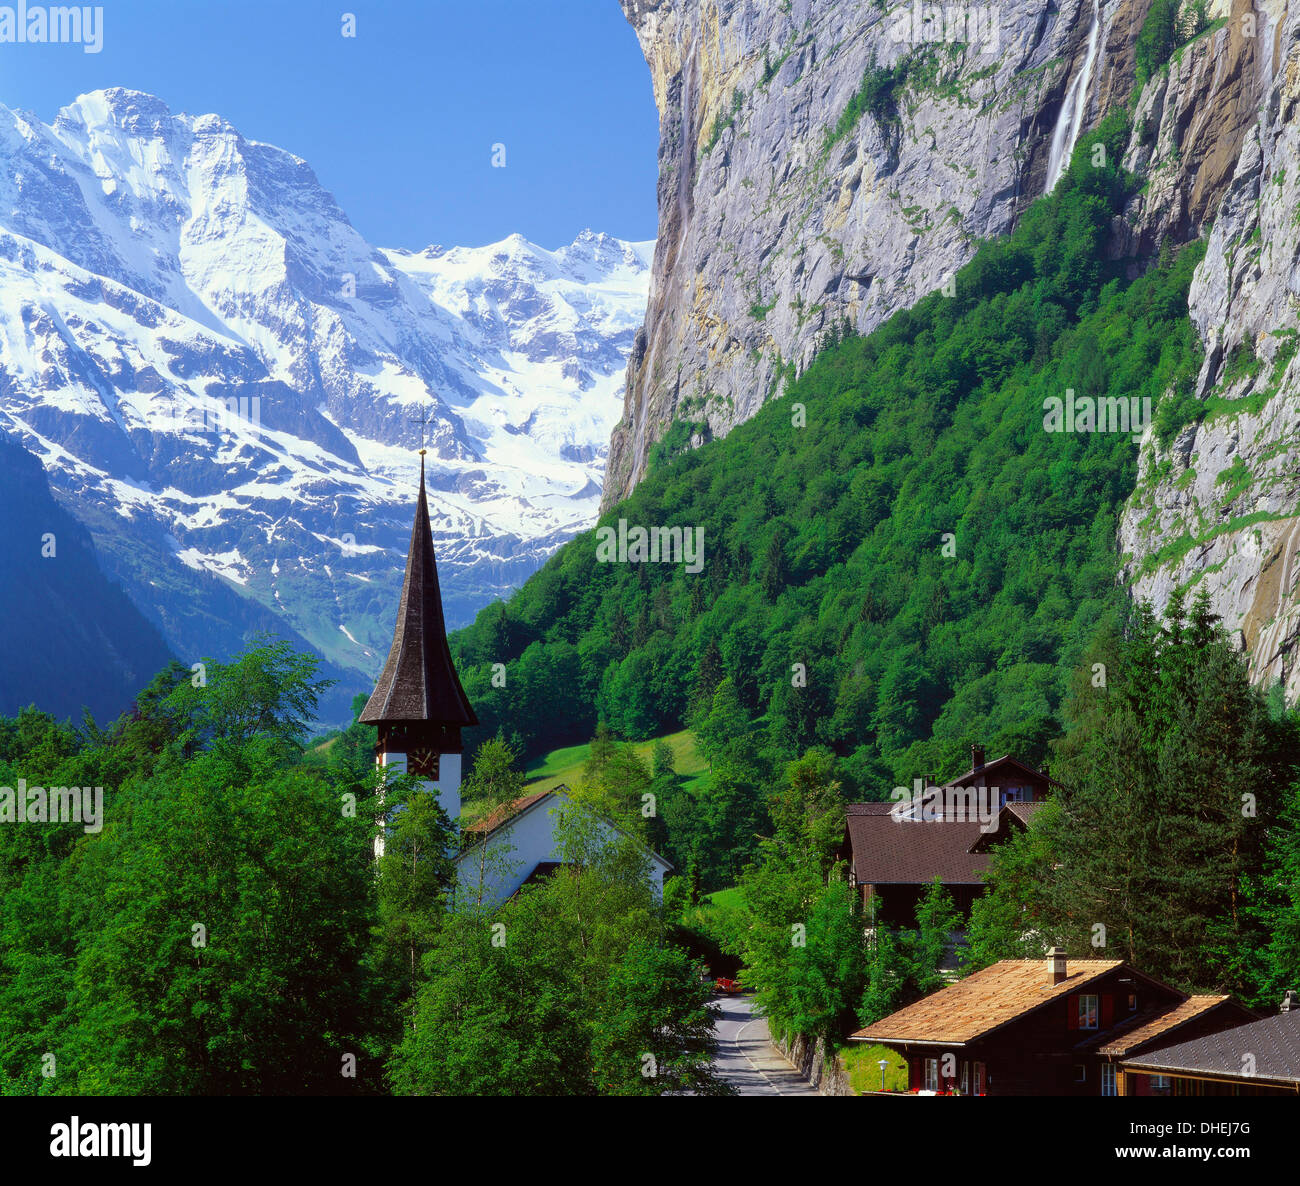 Lauterbrunnen, Jungfrau Region, Switzerland Stock Photo